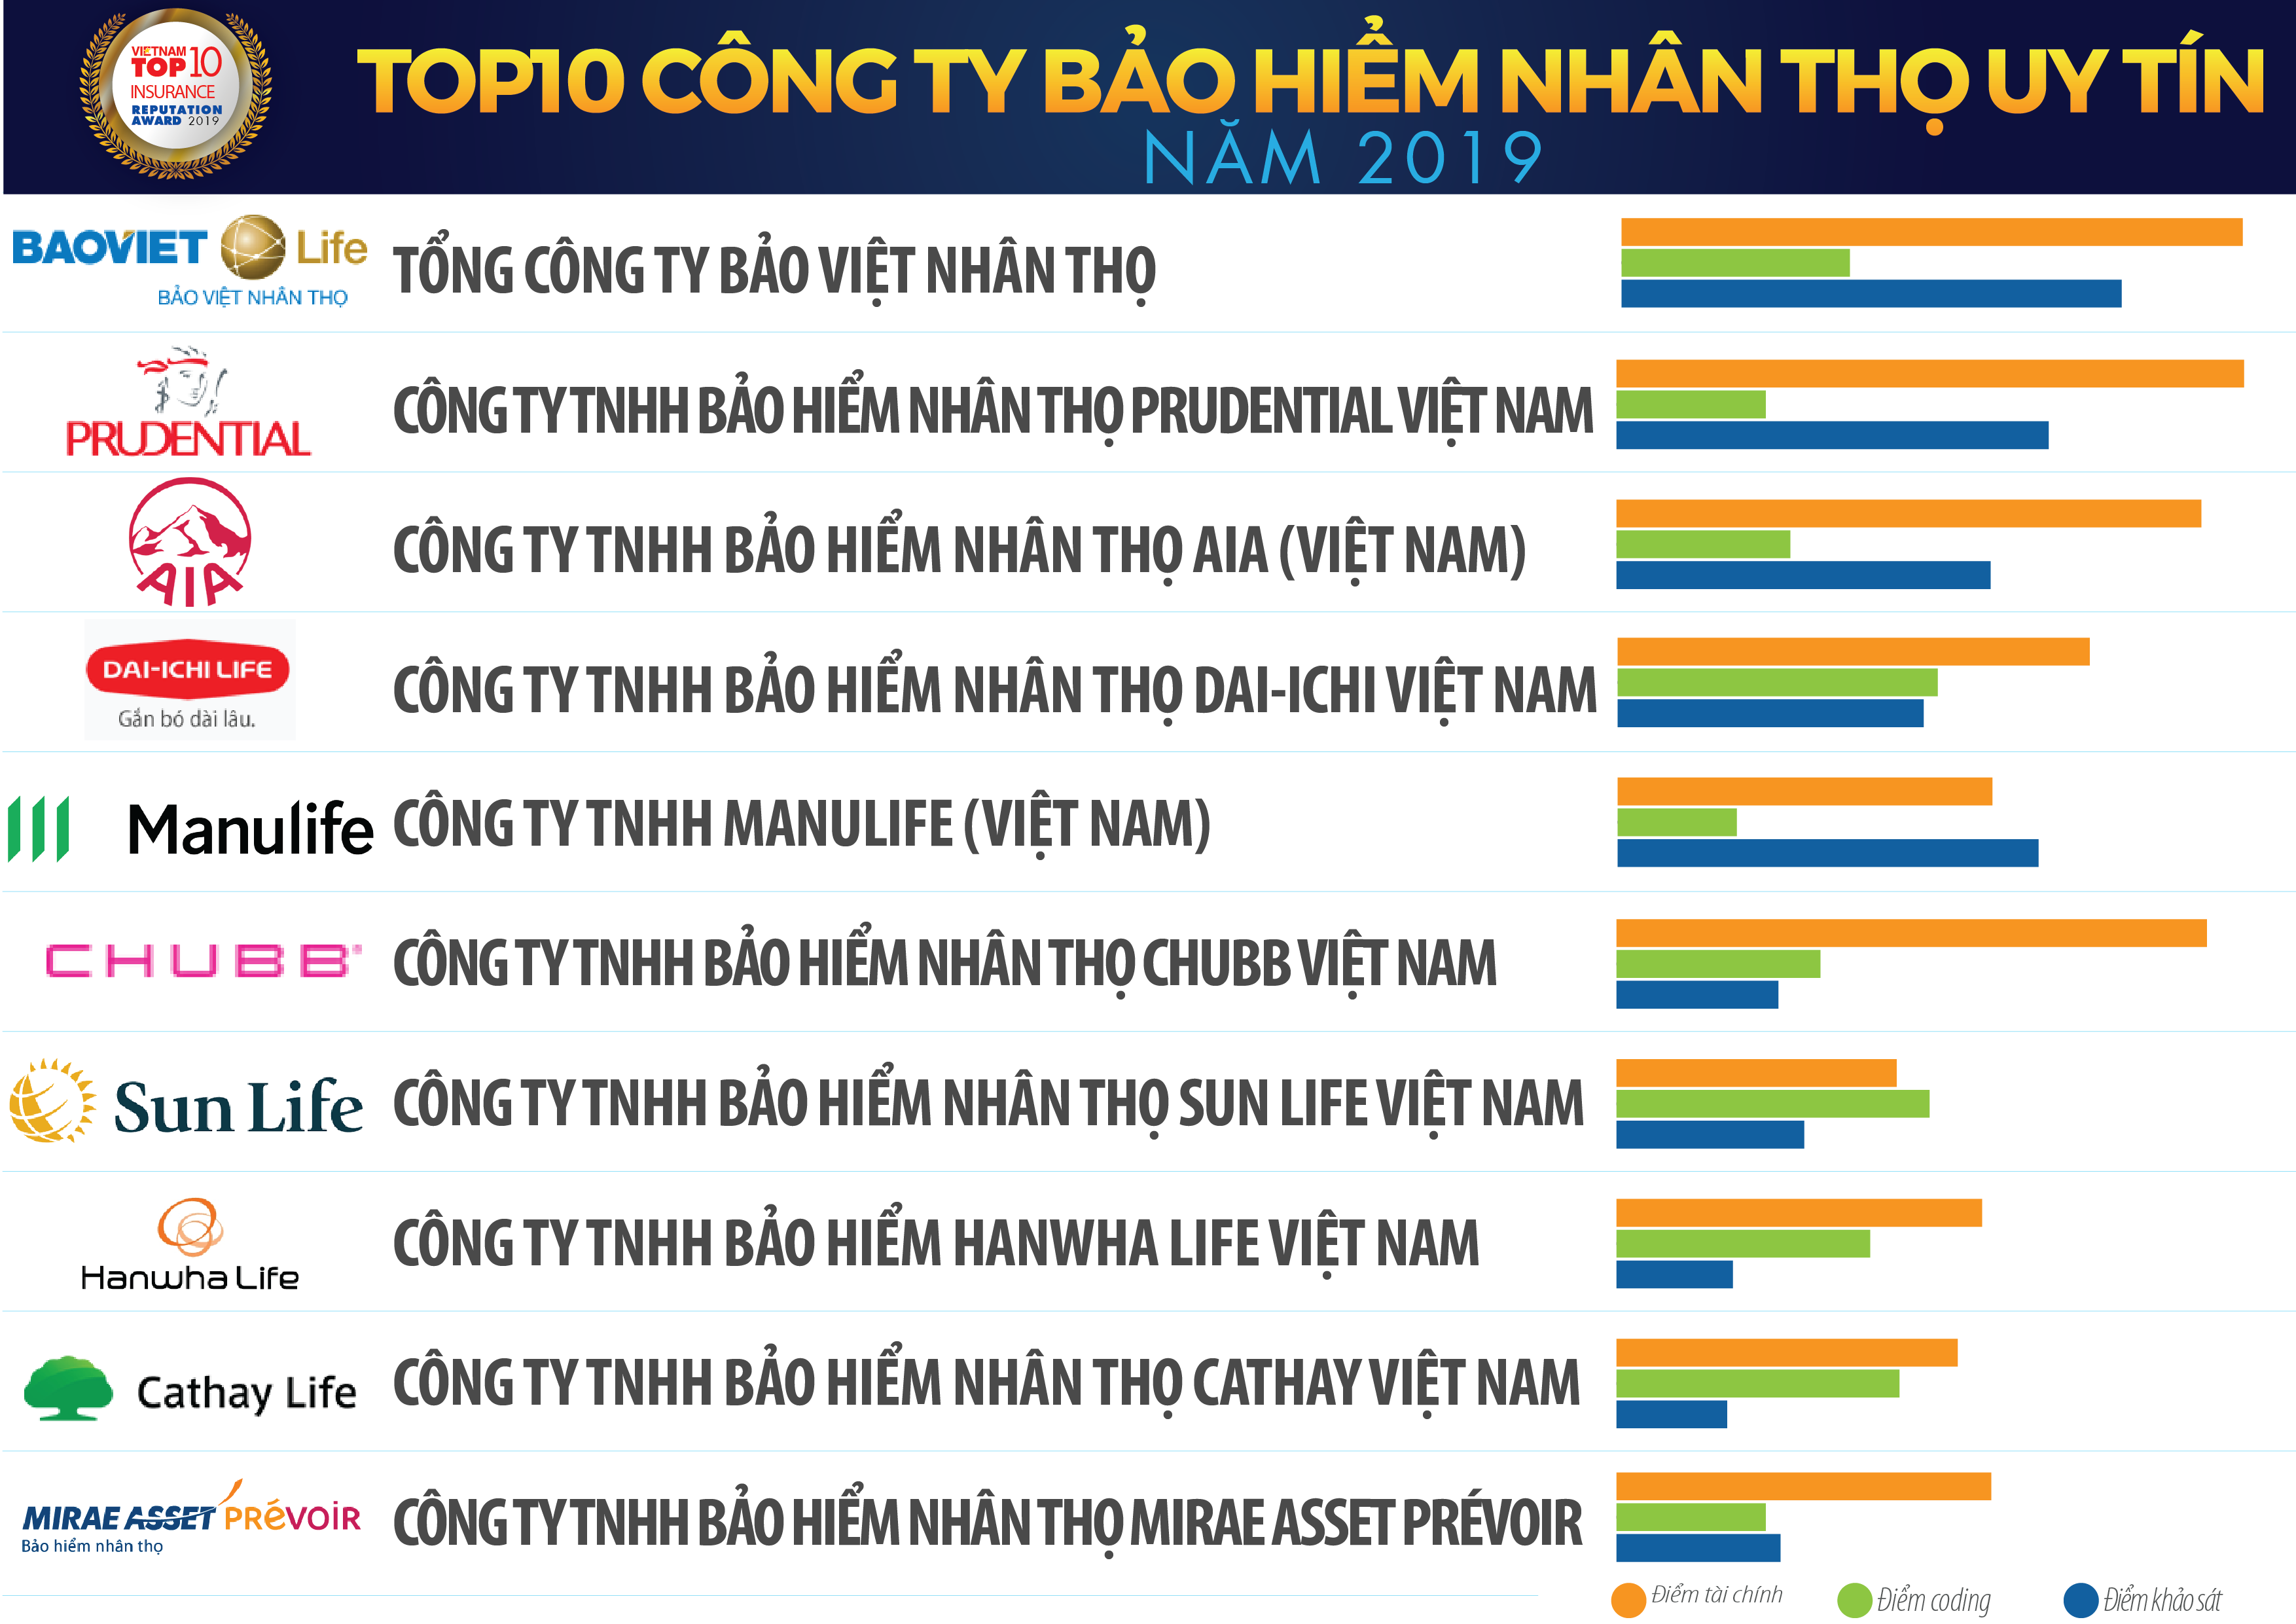 bvnt-dung-dau-danh-sach-top-10-cong-ty-bap-hiem-nhan-tho-uy-tin-2019